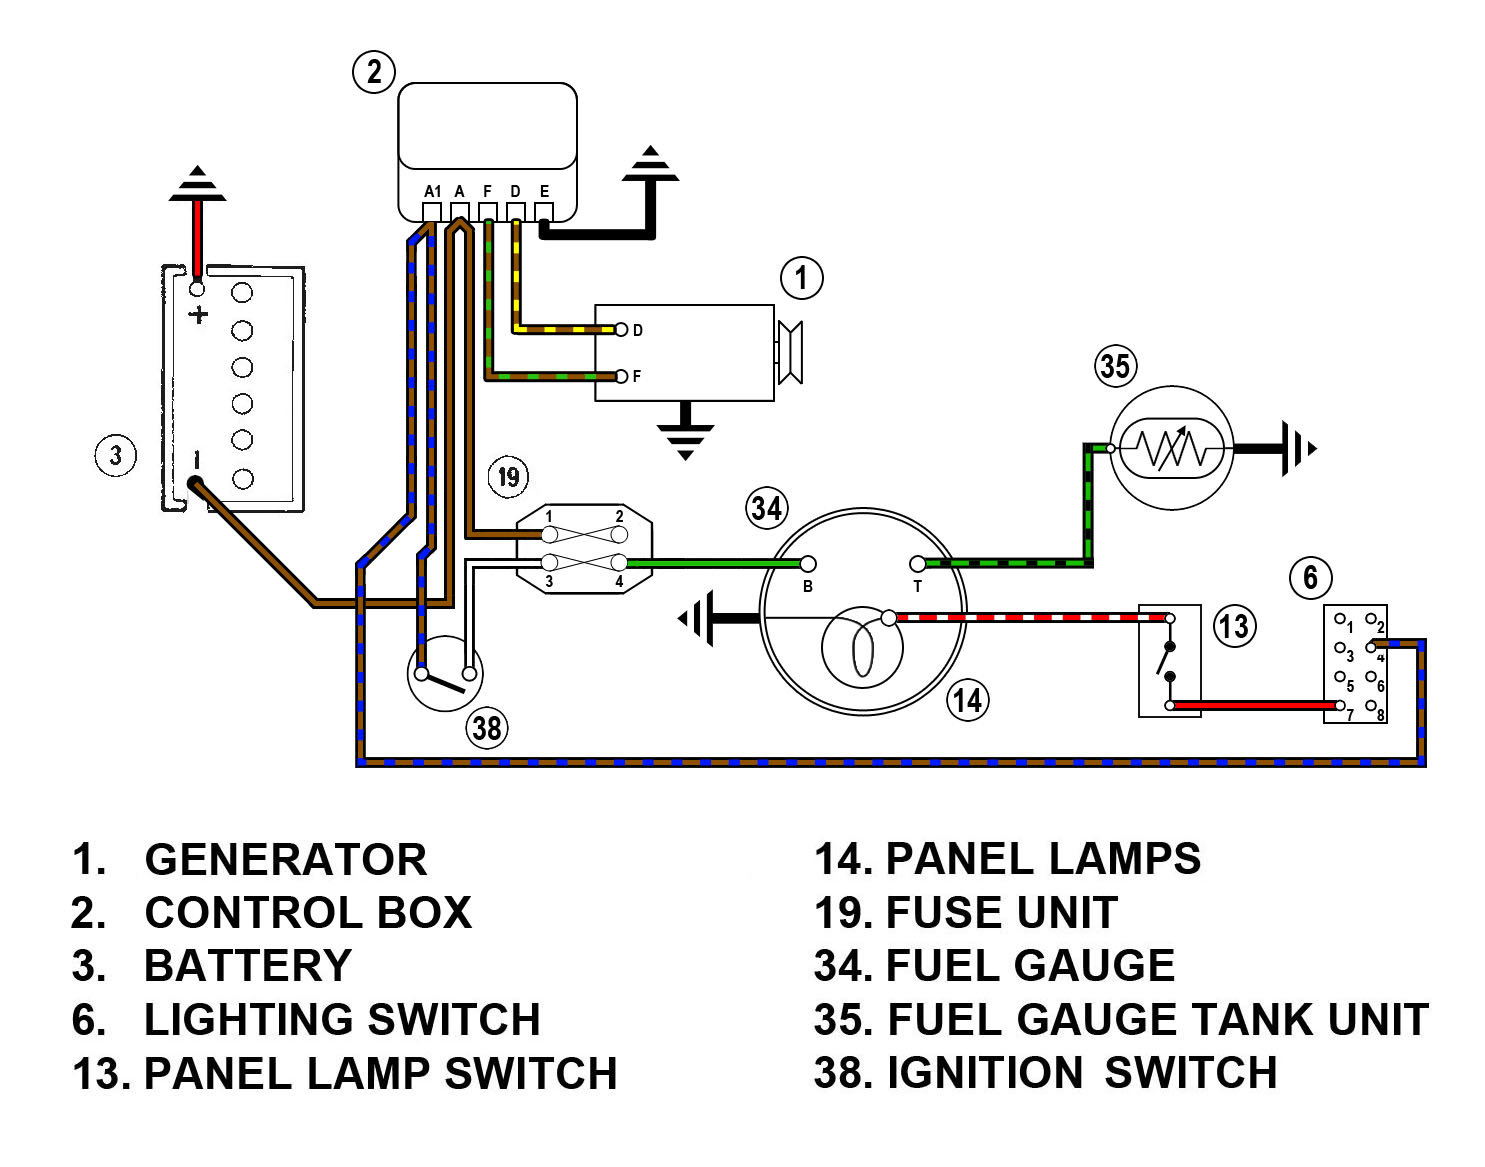 HC_4292] Auto Meter Sport Comp Wiring Diagram Free Picture Wiring Diagram  Download DiagramNect Tobiq Mohammedshrine Librar Wiring 101